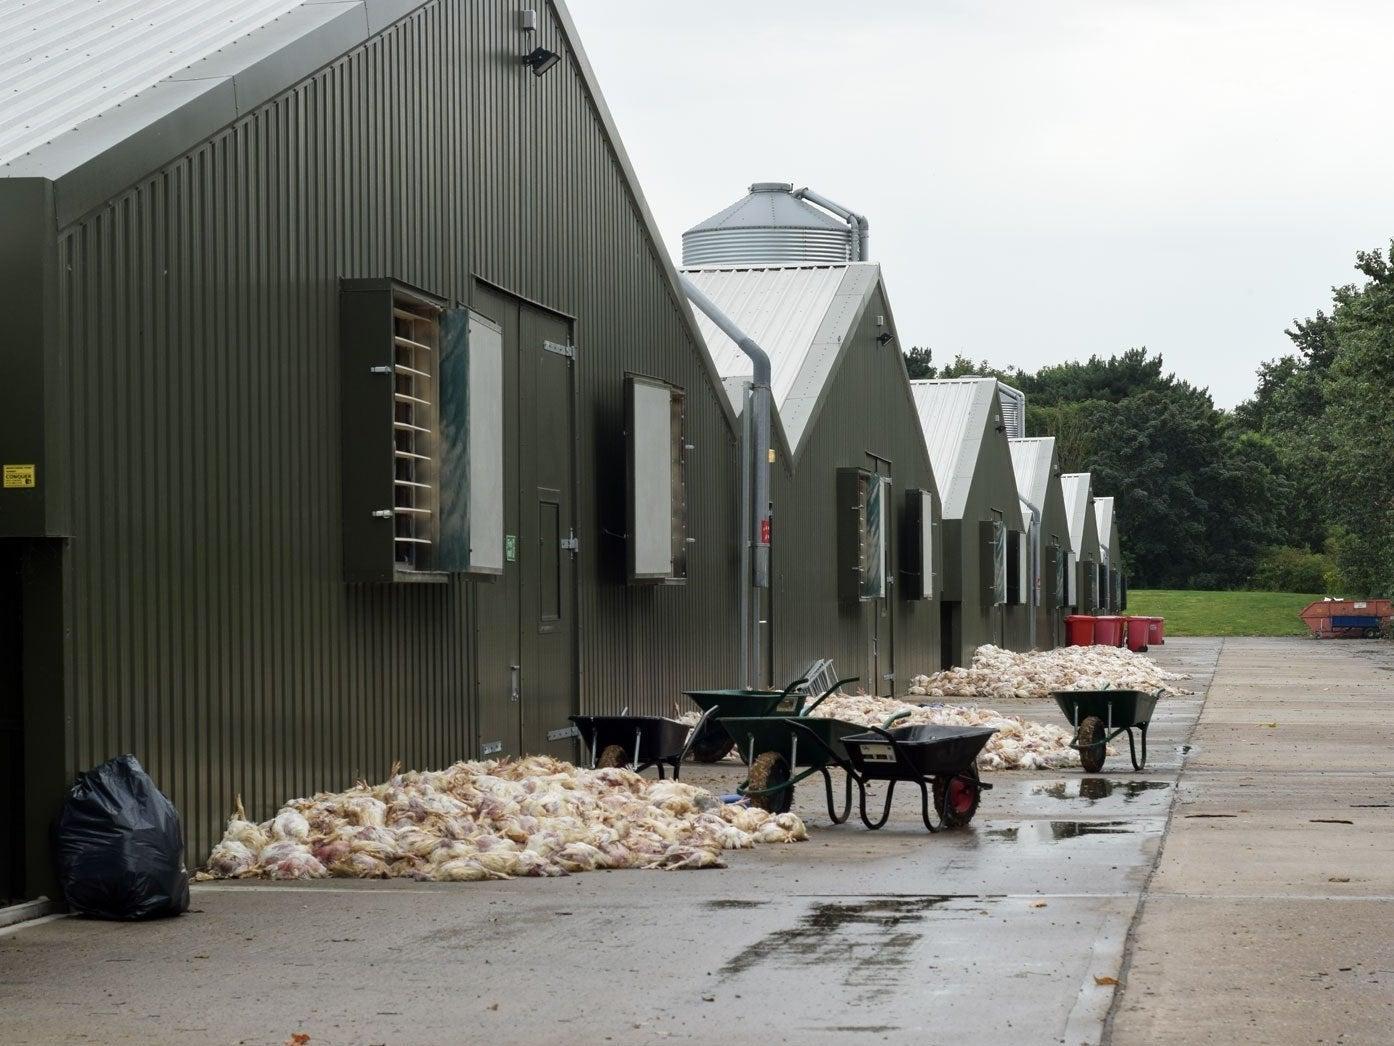 thousands of chickens die in heatwave at farm supplying